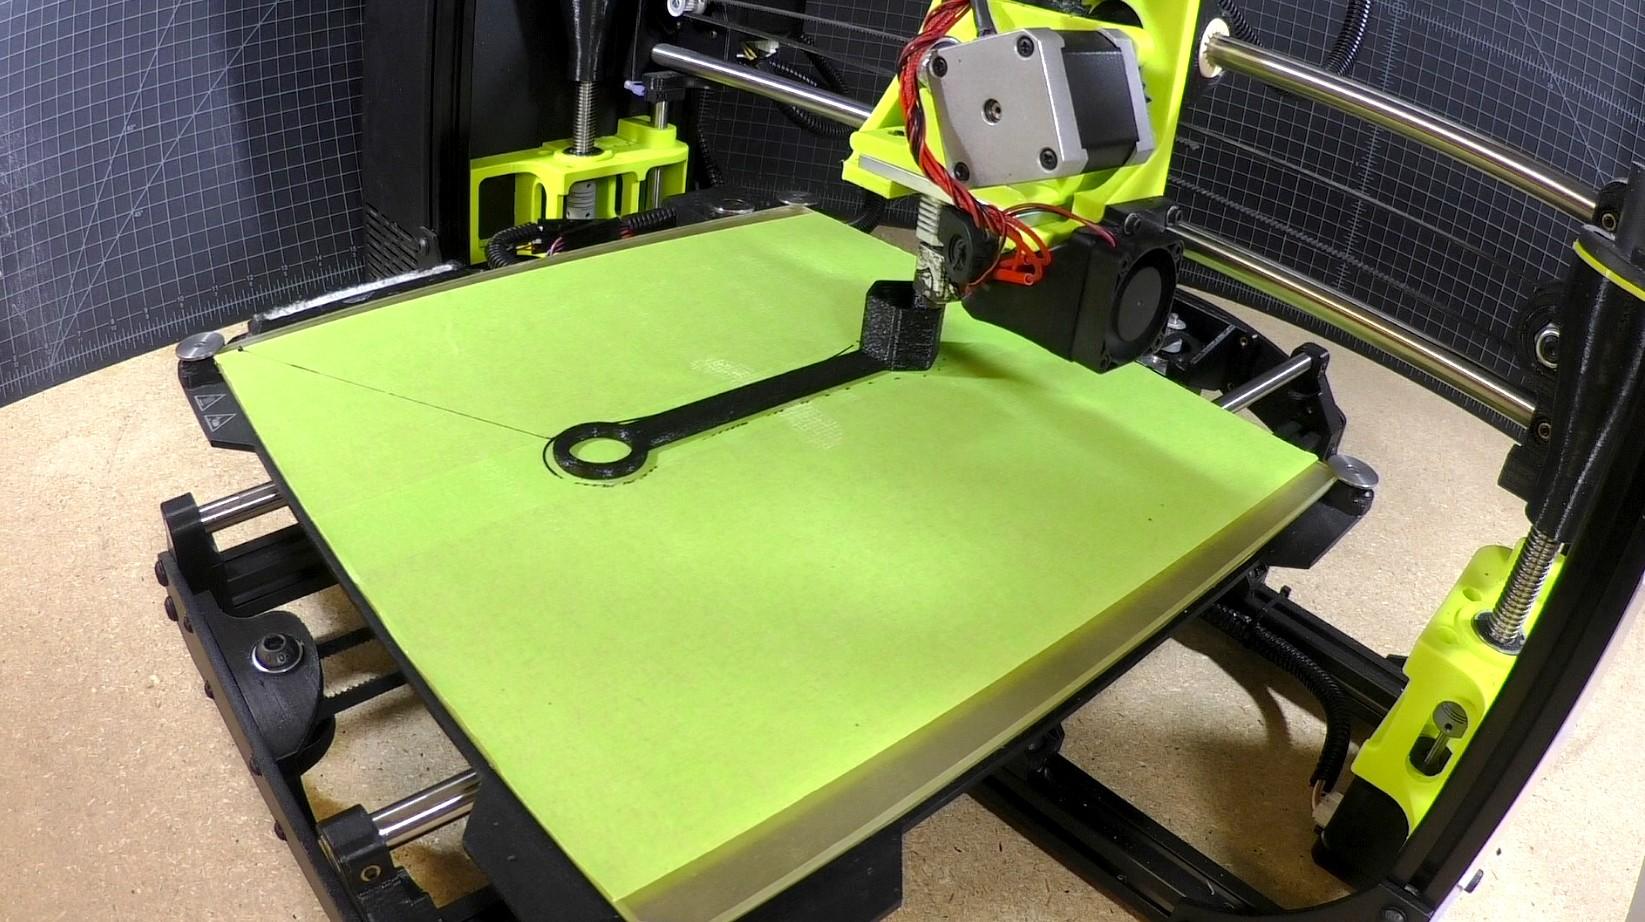 Large-Scale 3D Printer BigRep ONE - Industrial 3D Printing